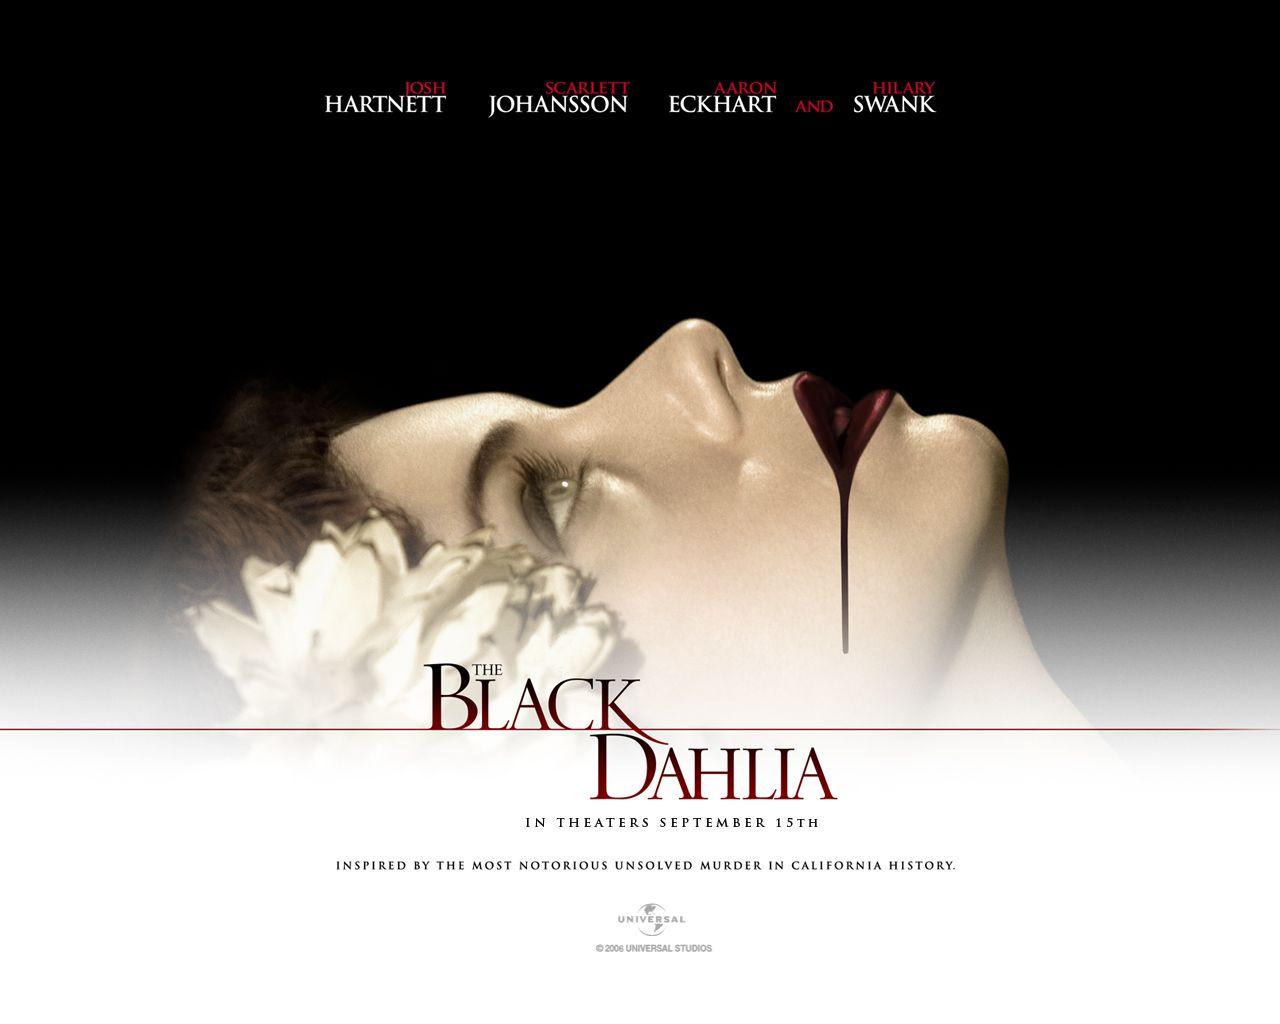 http://1.bp.blogspot.com/-3J_5_z_BDFA/T_6f_QSya_I/AAAAAAAADhA/WoxnyzhyEzs/s1600/2006_the_black_dahlia_wallpaper_002.jpg